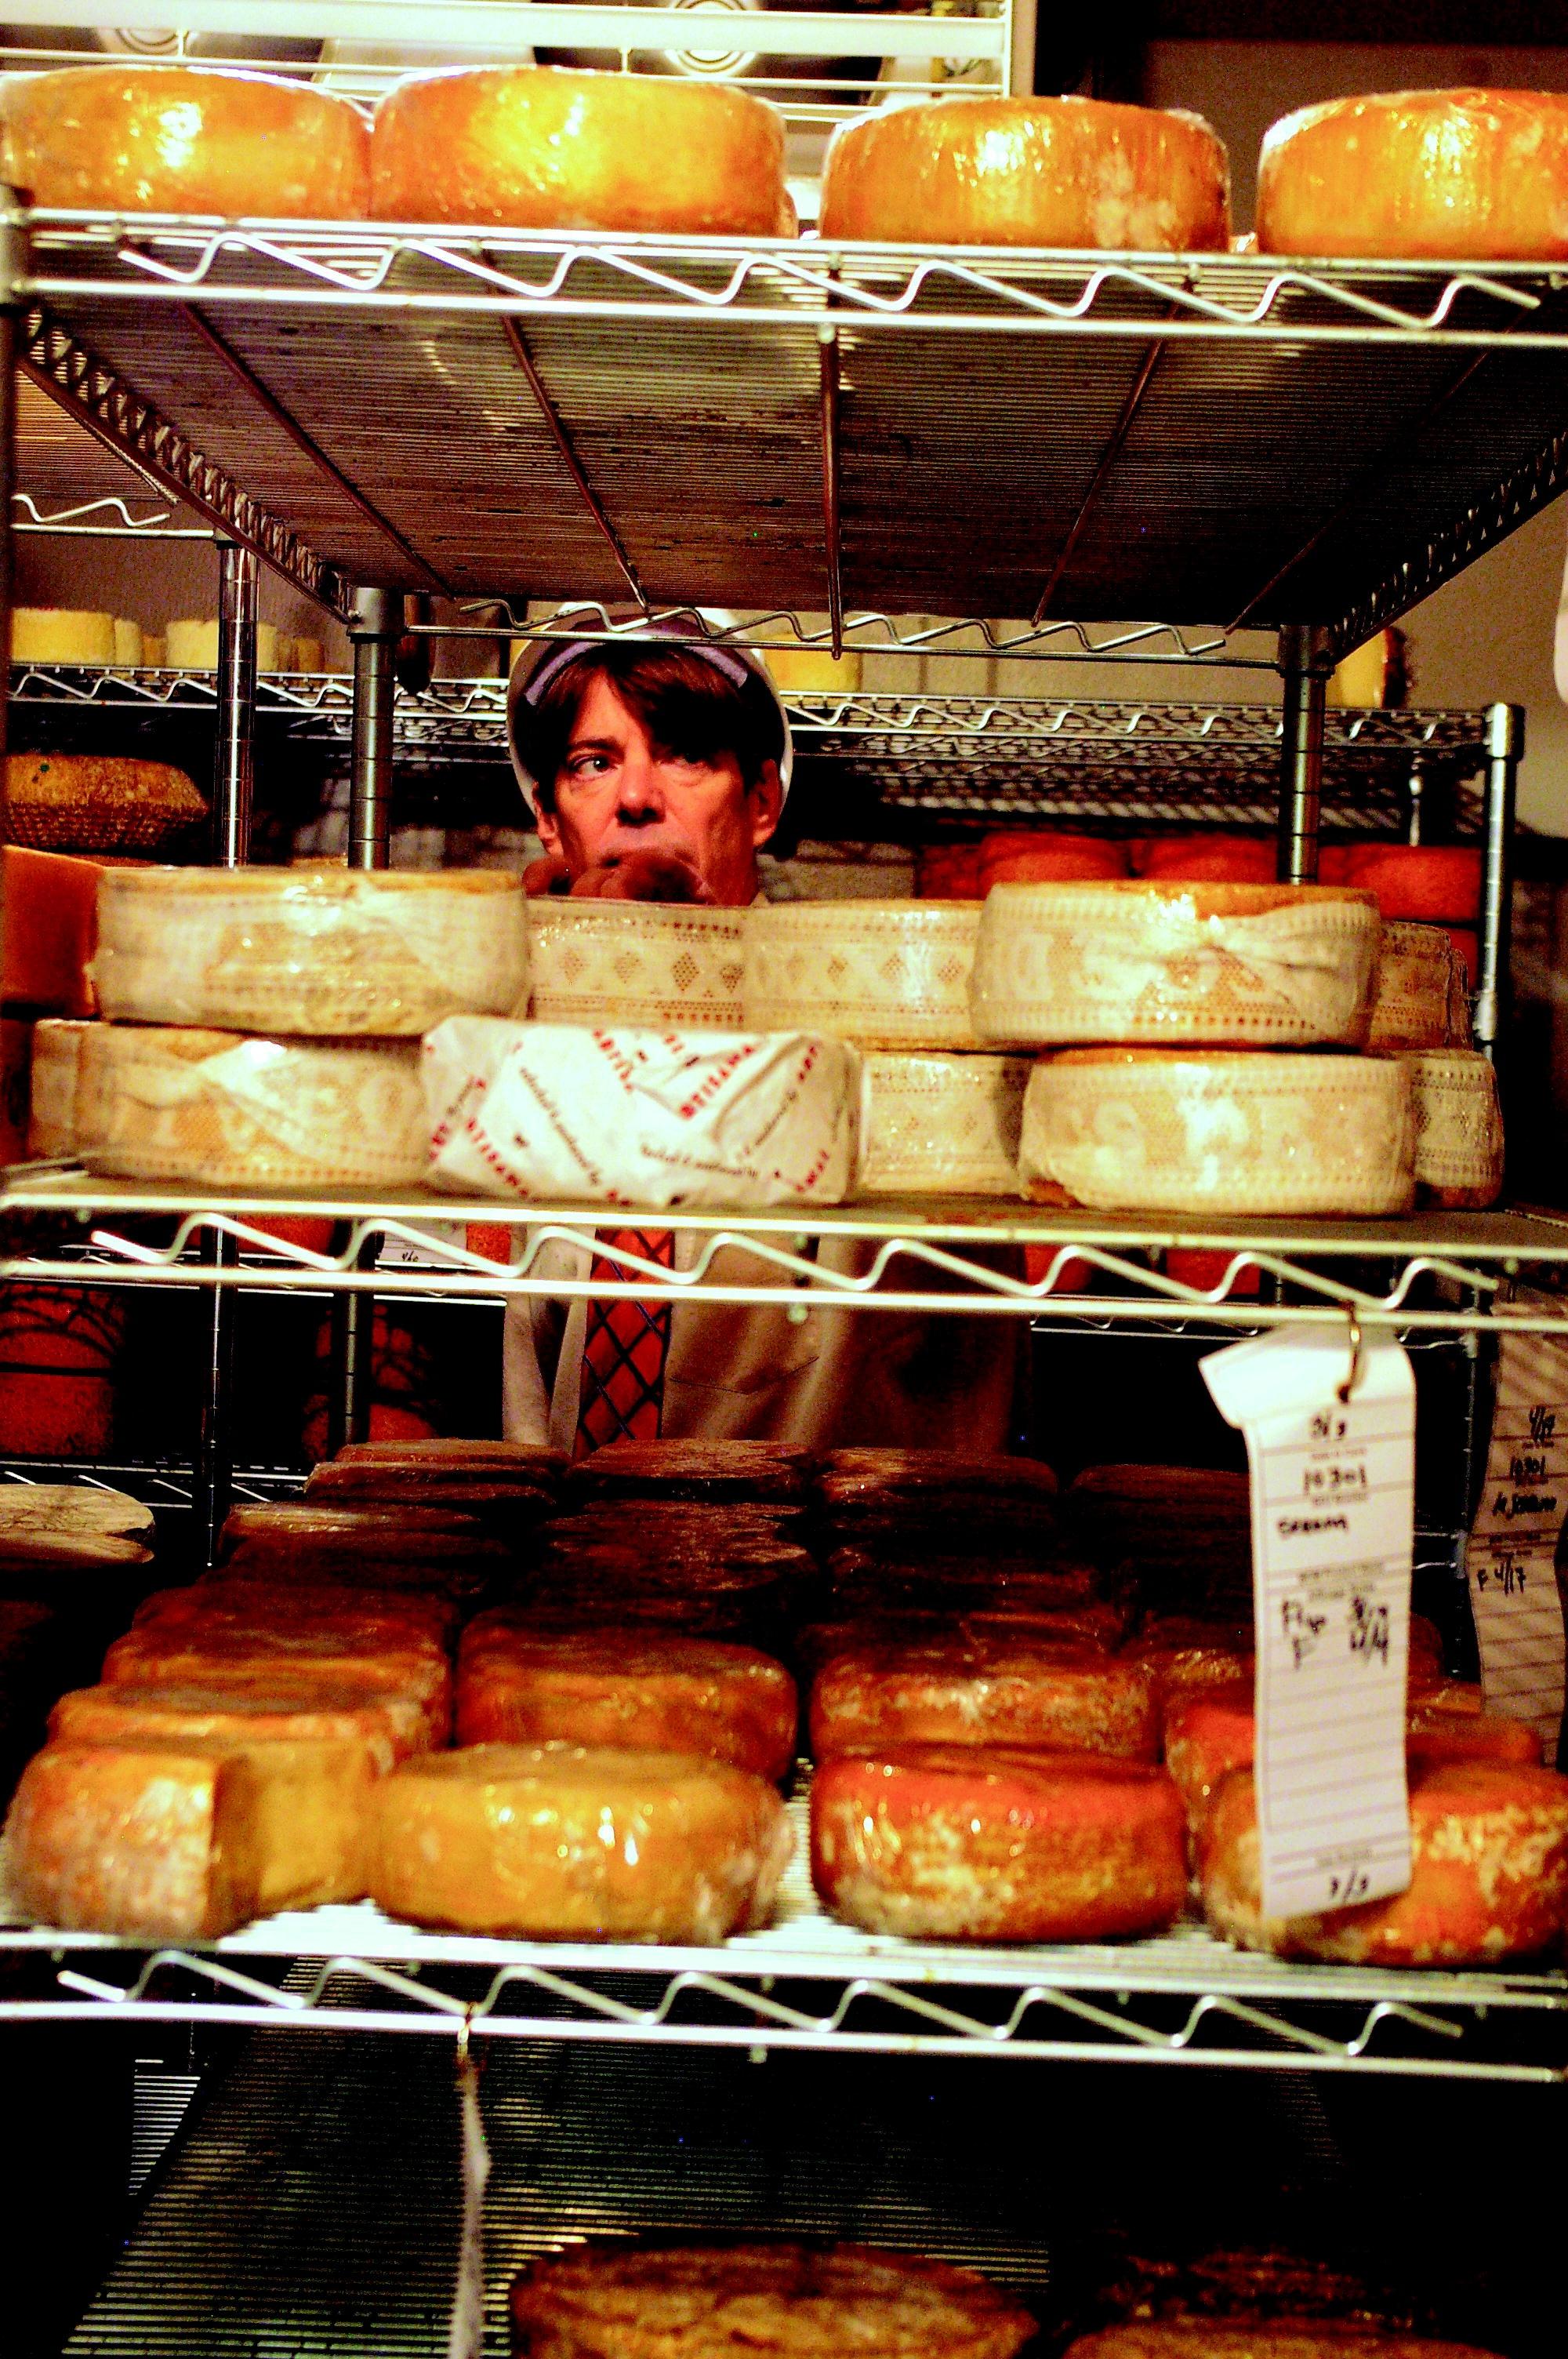 max-mccalman-in-cheese-cave.jpg